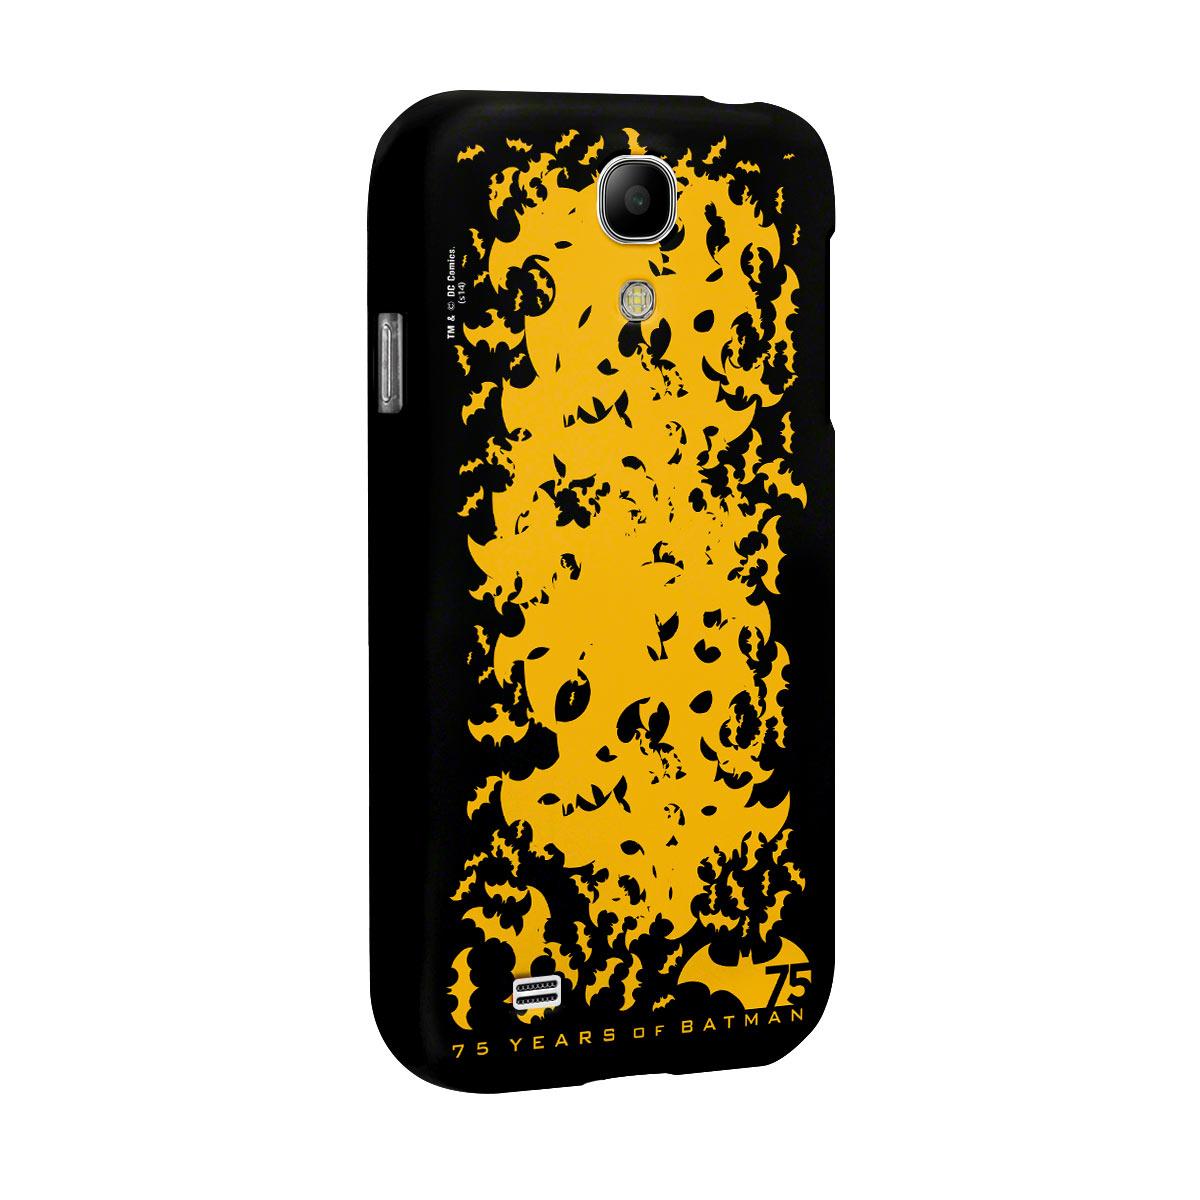 Capa de Celular Samsung S4 Batman 75 Anos Bats